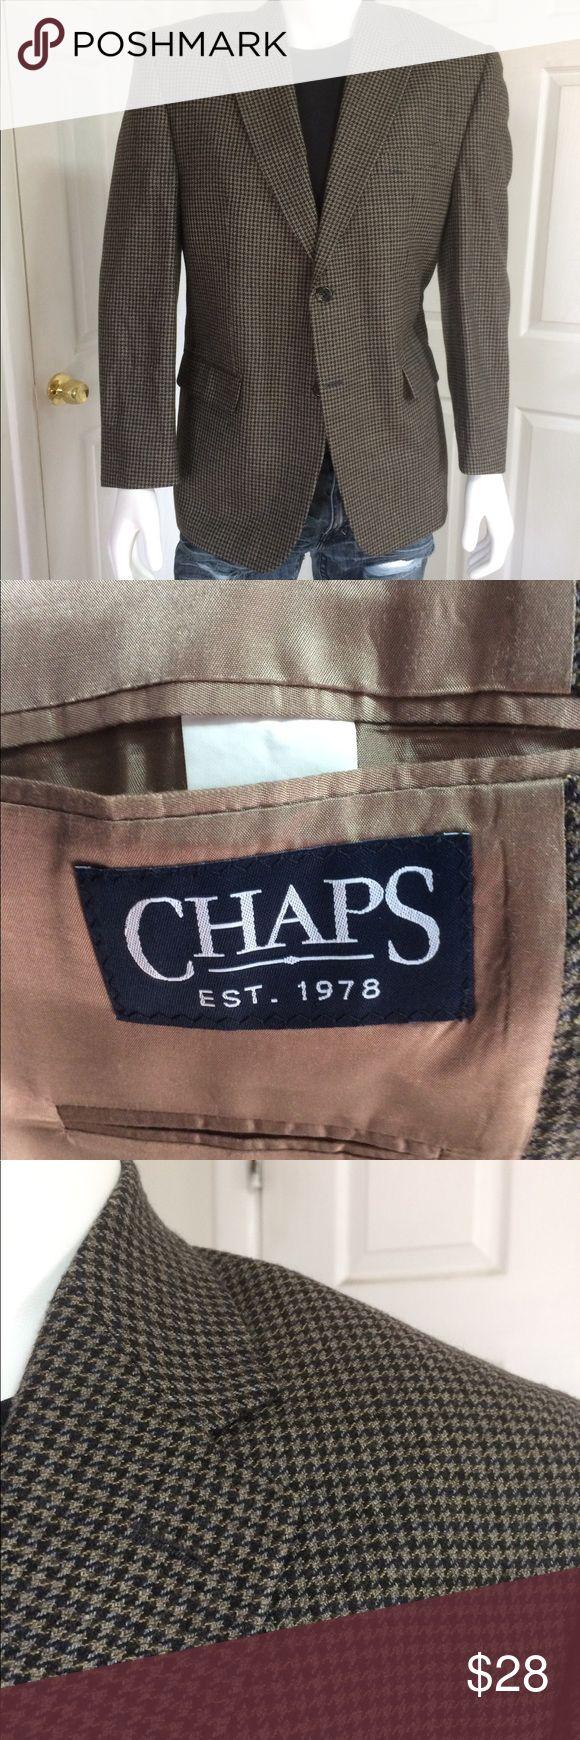 Chaps Ralph Lauren houndstooth beige blazer 44R 100% Lambs Wool Chaps Ralph Lauren houndstooth beige blazer 44R Chaps Suits & Blazers Sport Coats & Blazers